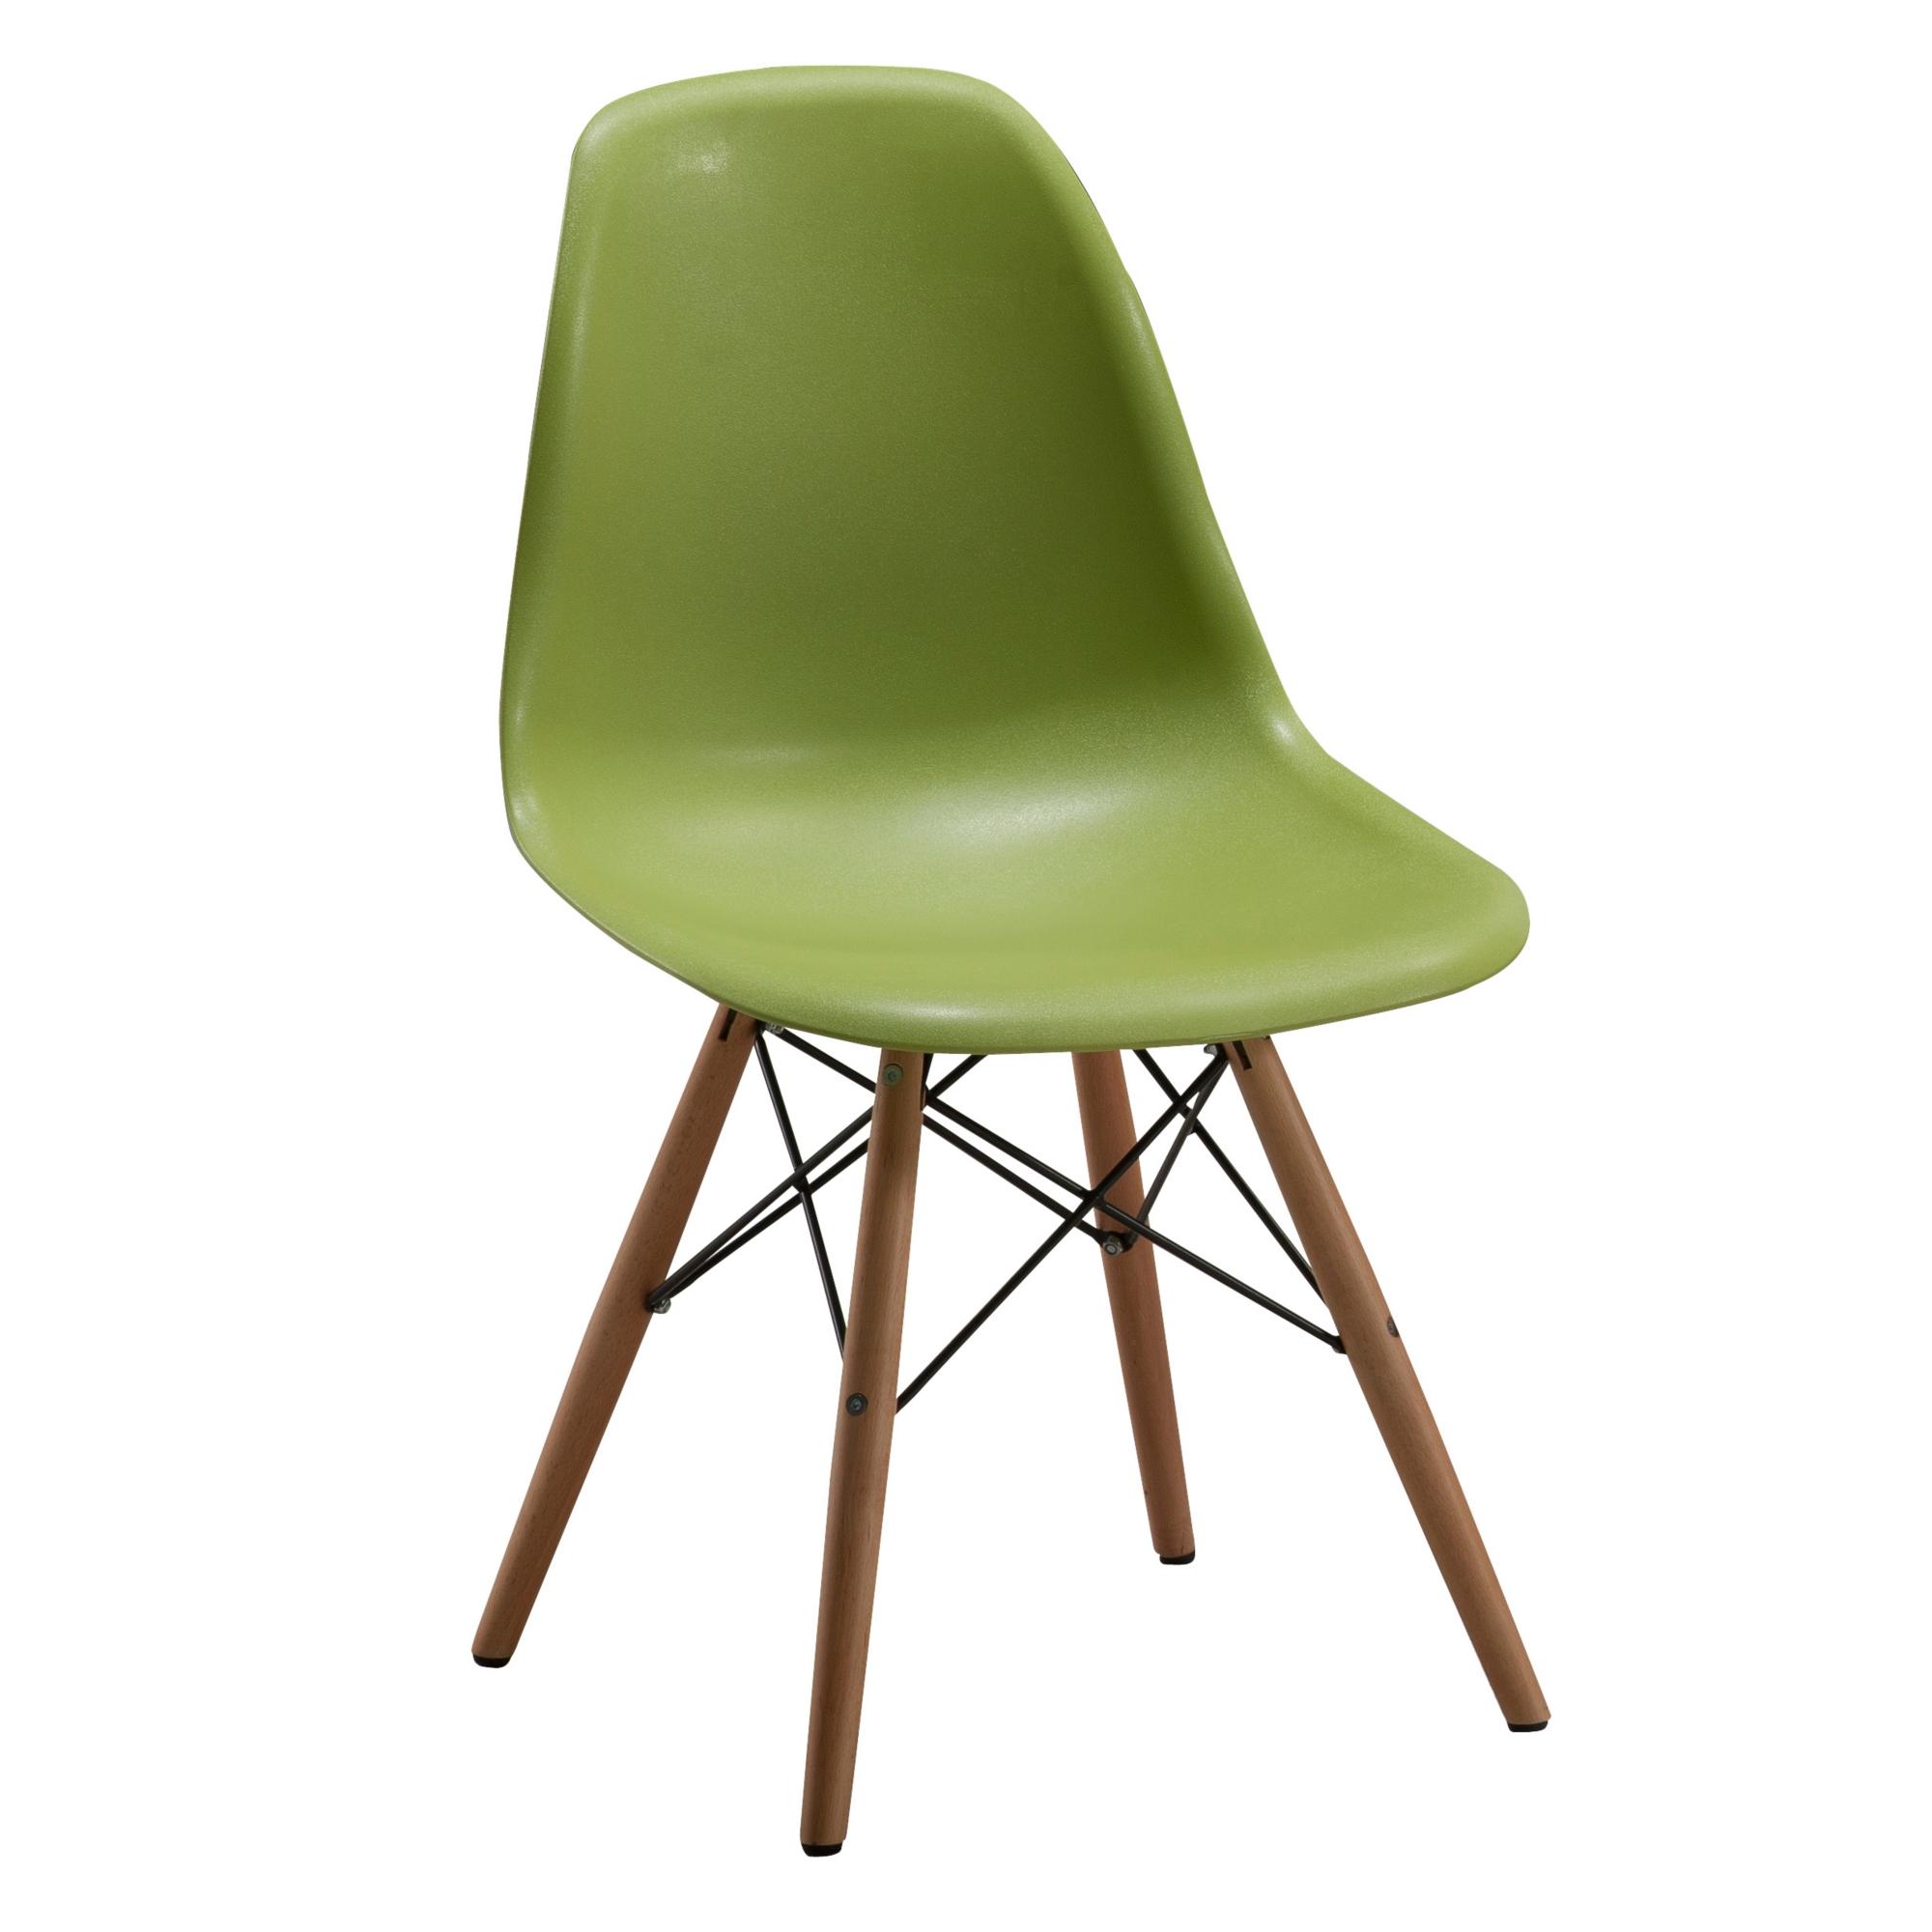 Eames chair lookalike